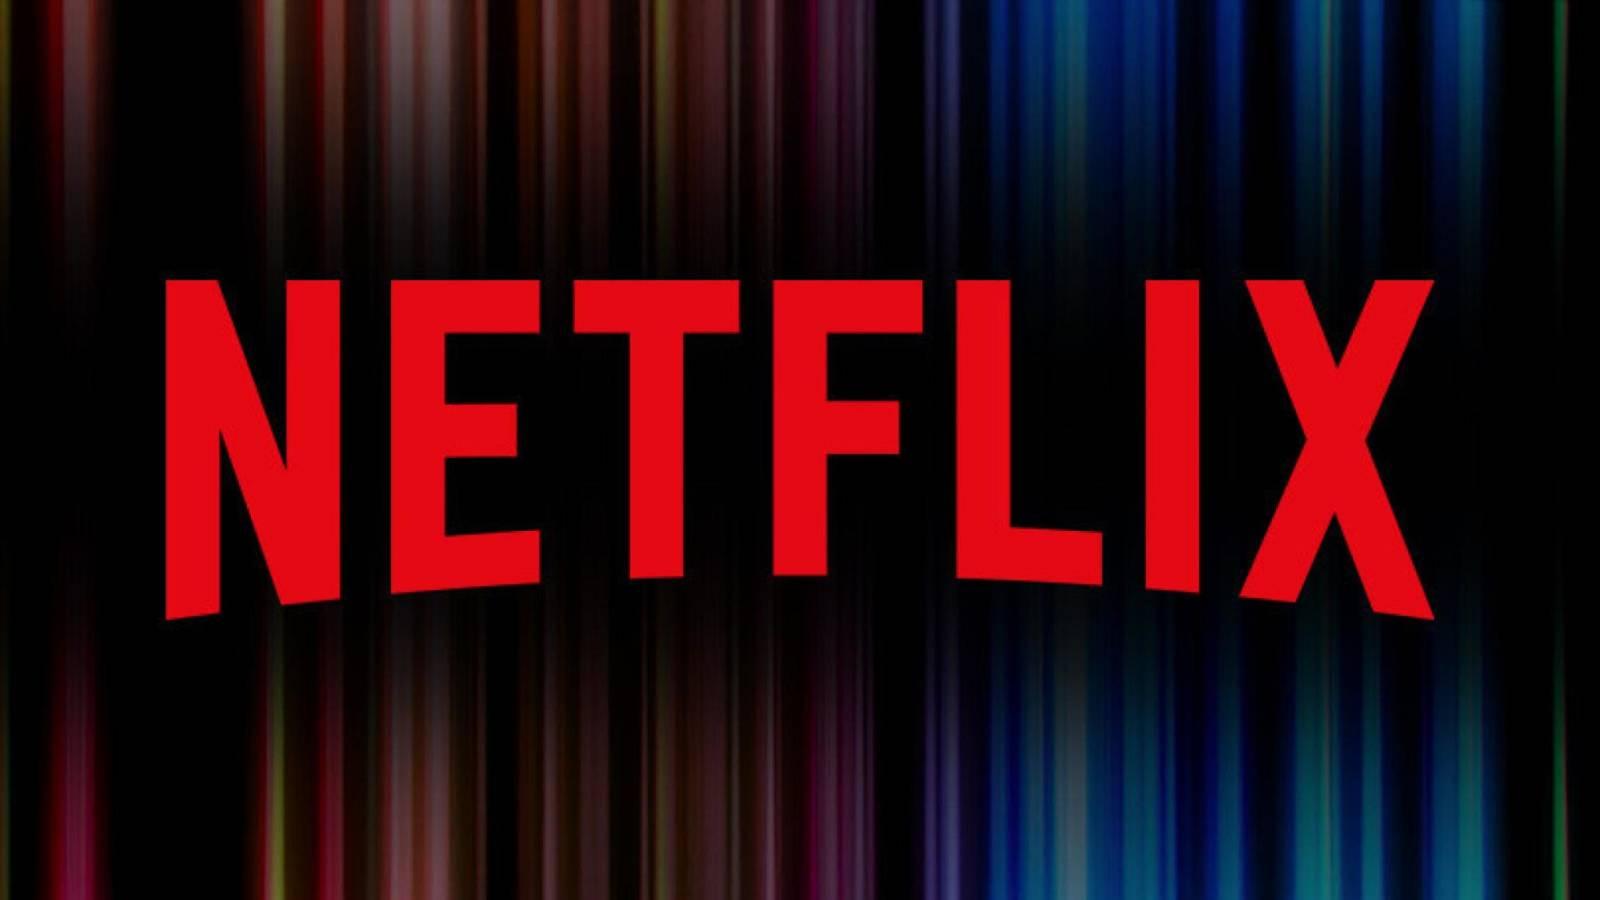 Netflix distribuiri